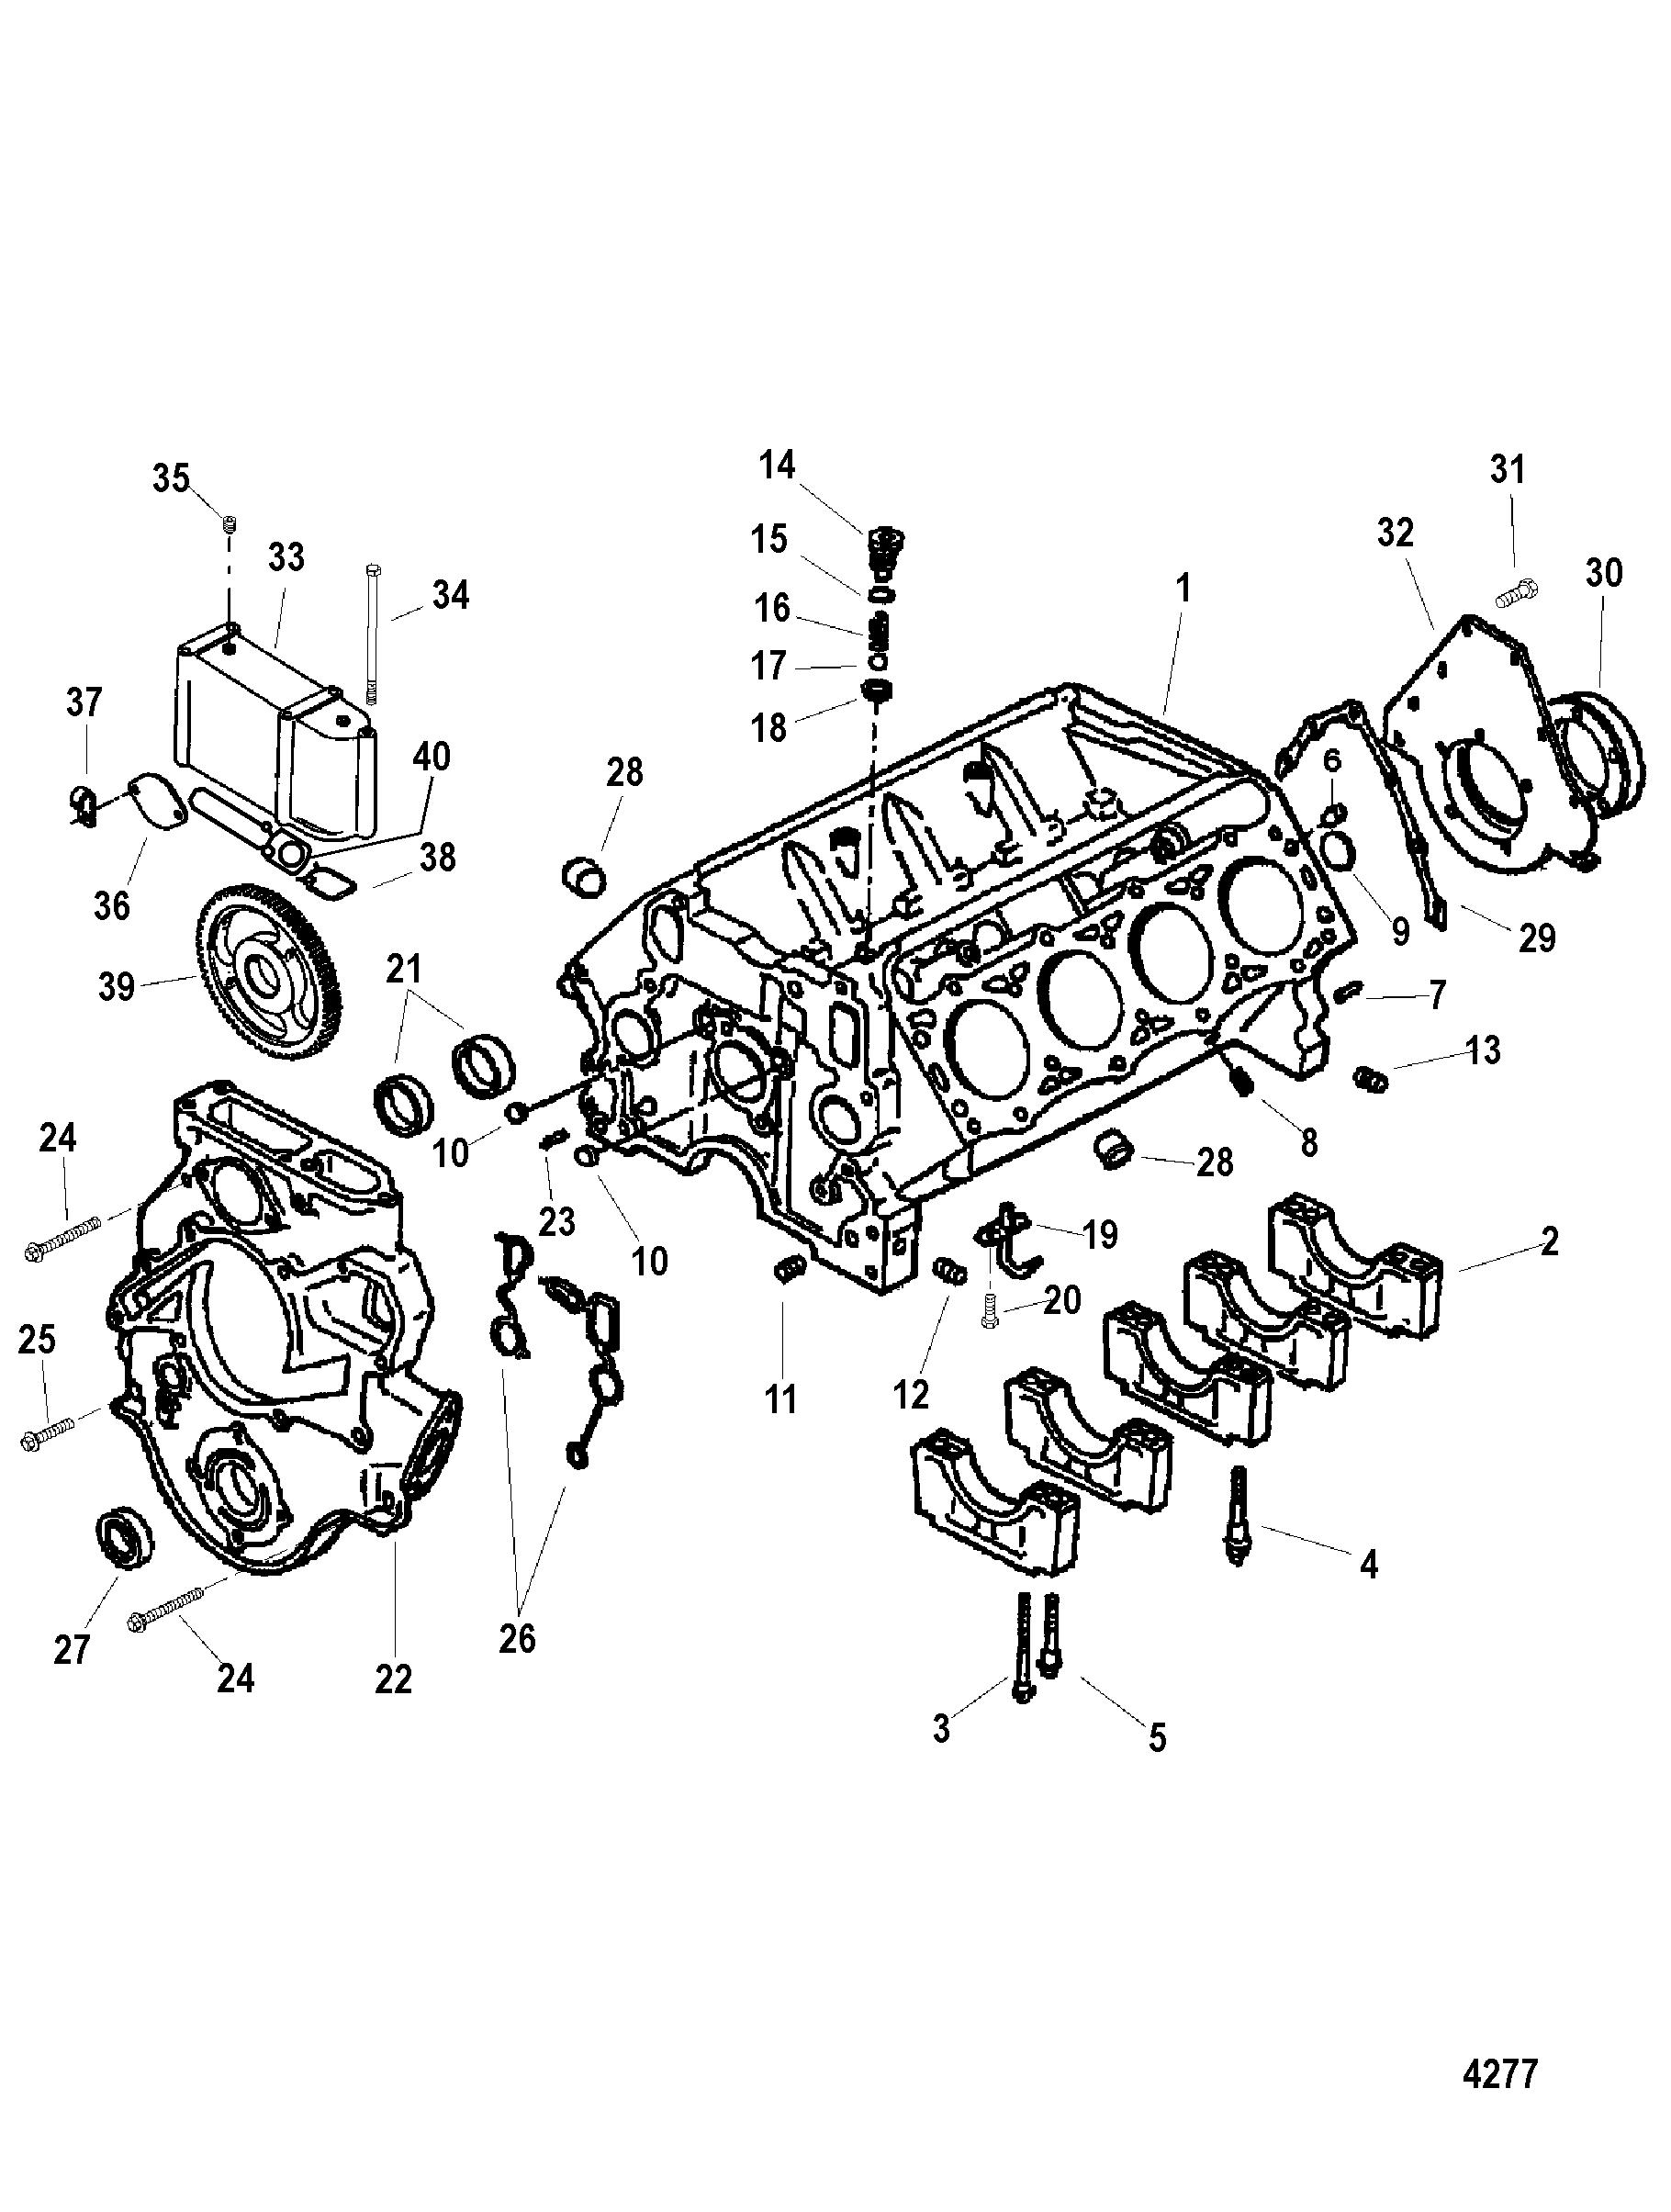 1983 ford alternator regulator wiring